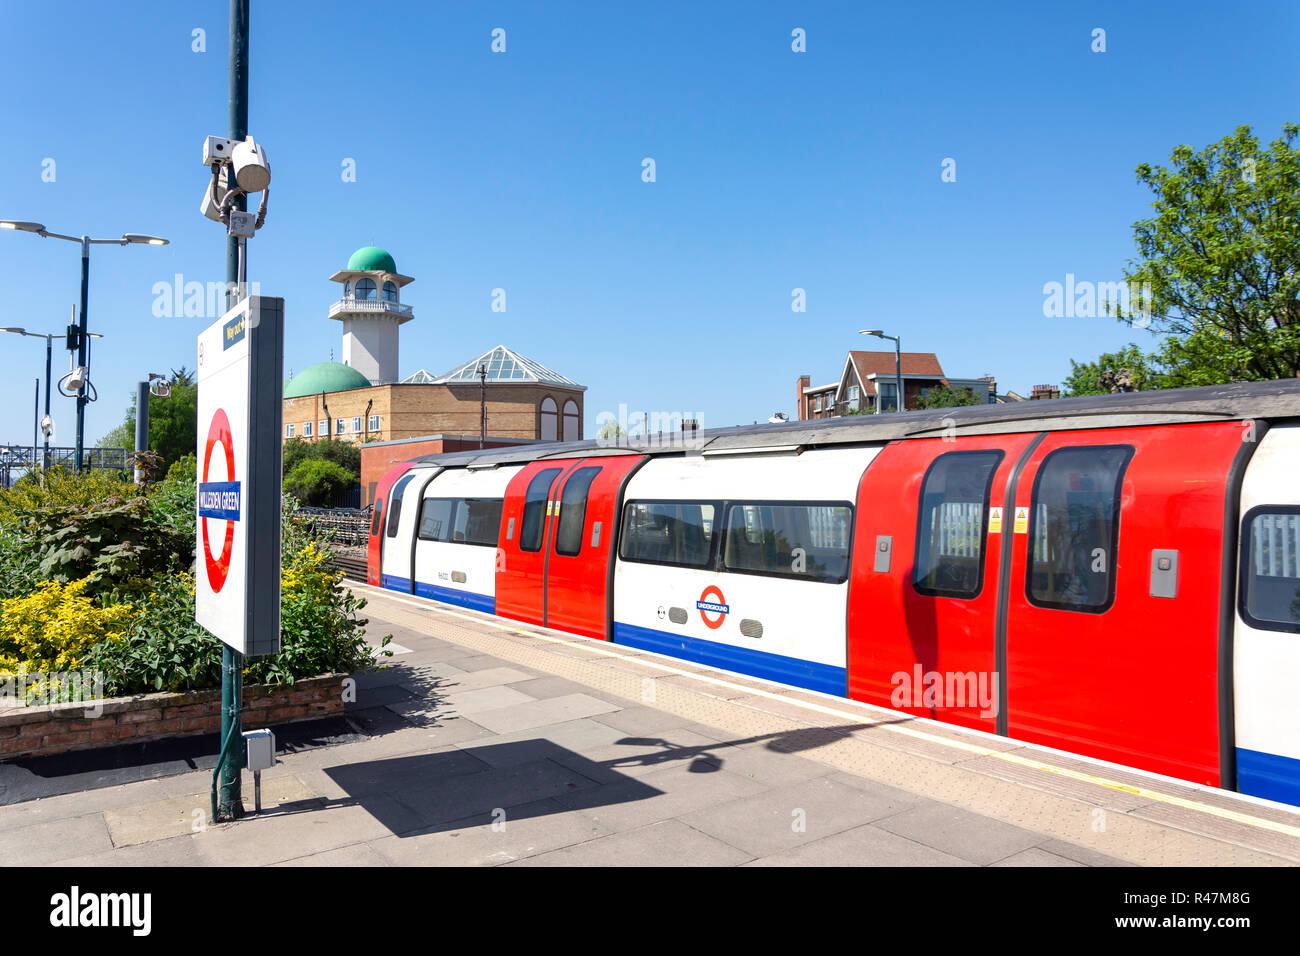 Platform at Willesden Green Underground Station, Willesden, London Borough of Brent, Greater London, England, United Kingdom - Stock Image